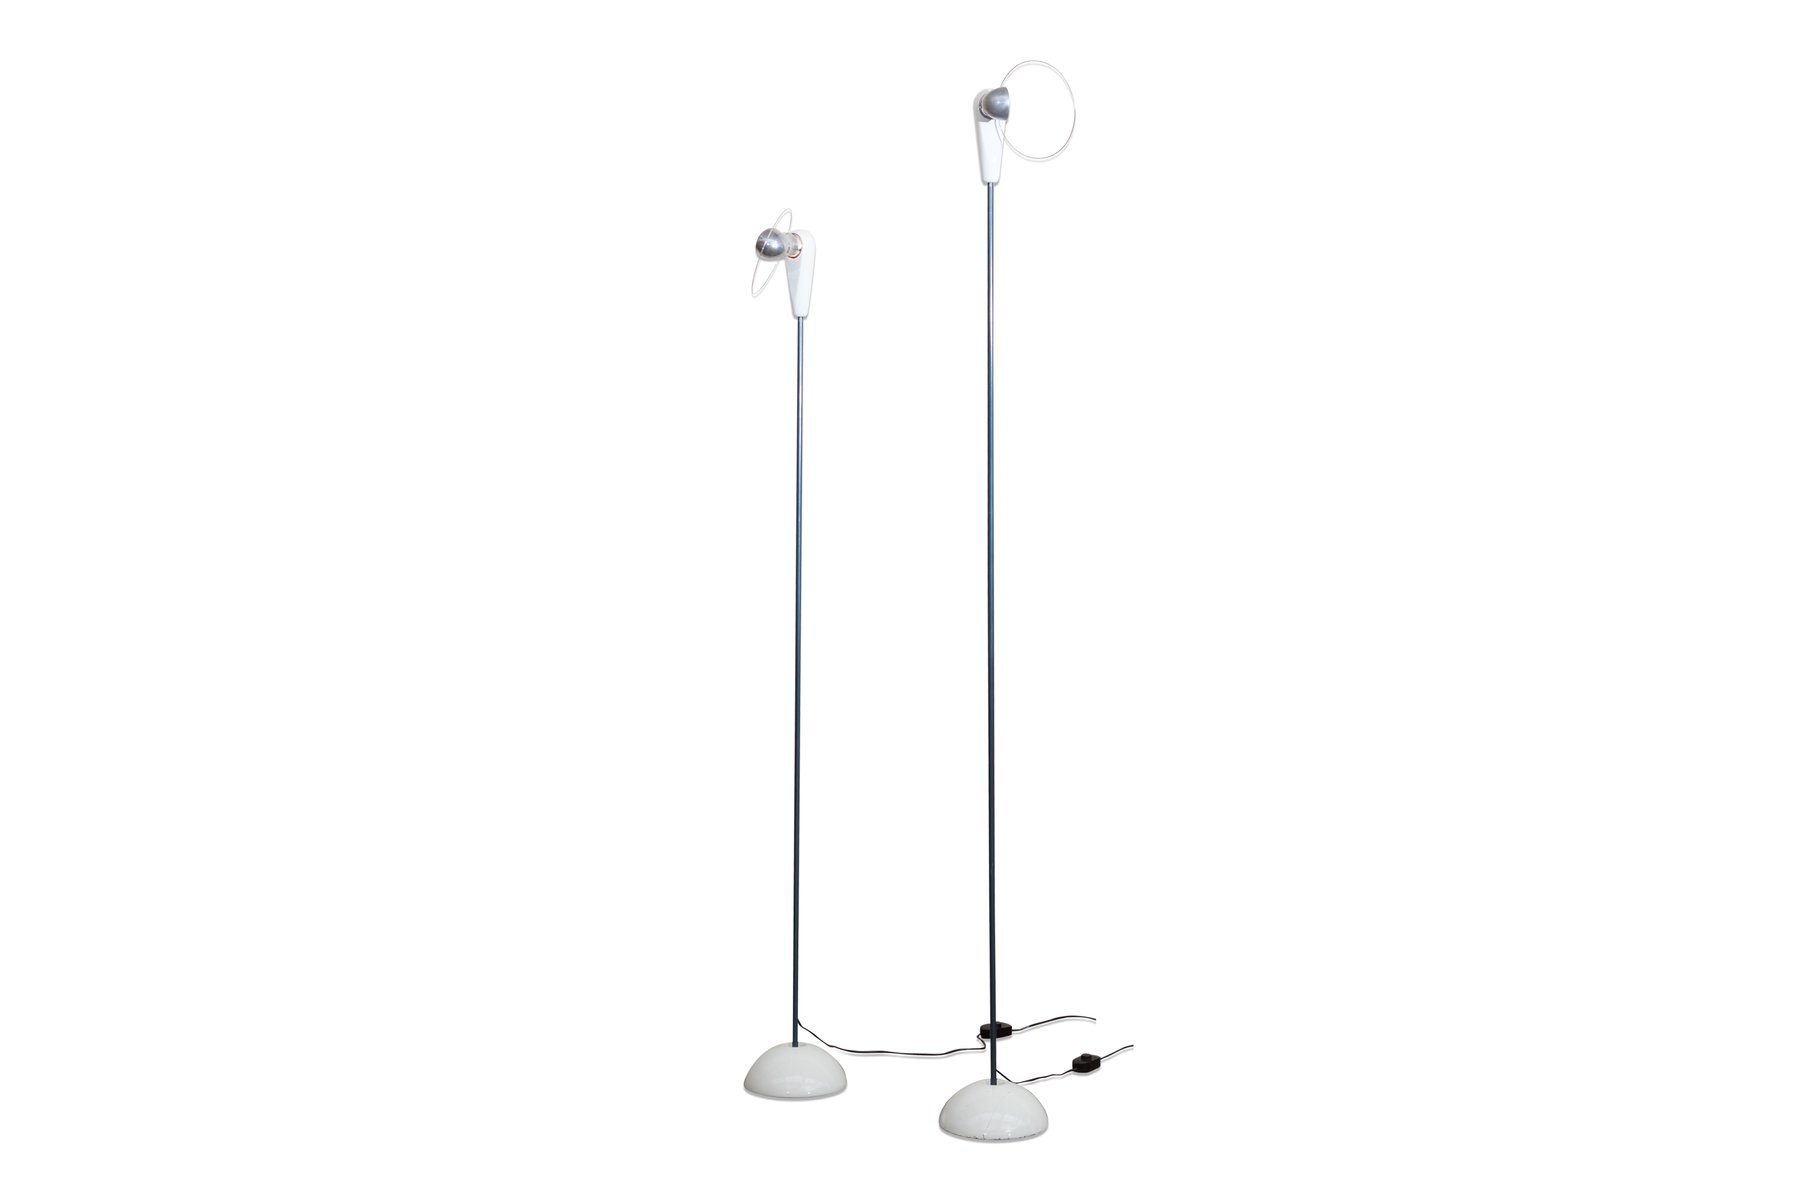 Lampade da terra bip bip vintage di achille castiglioni for Saldi lampade design